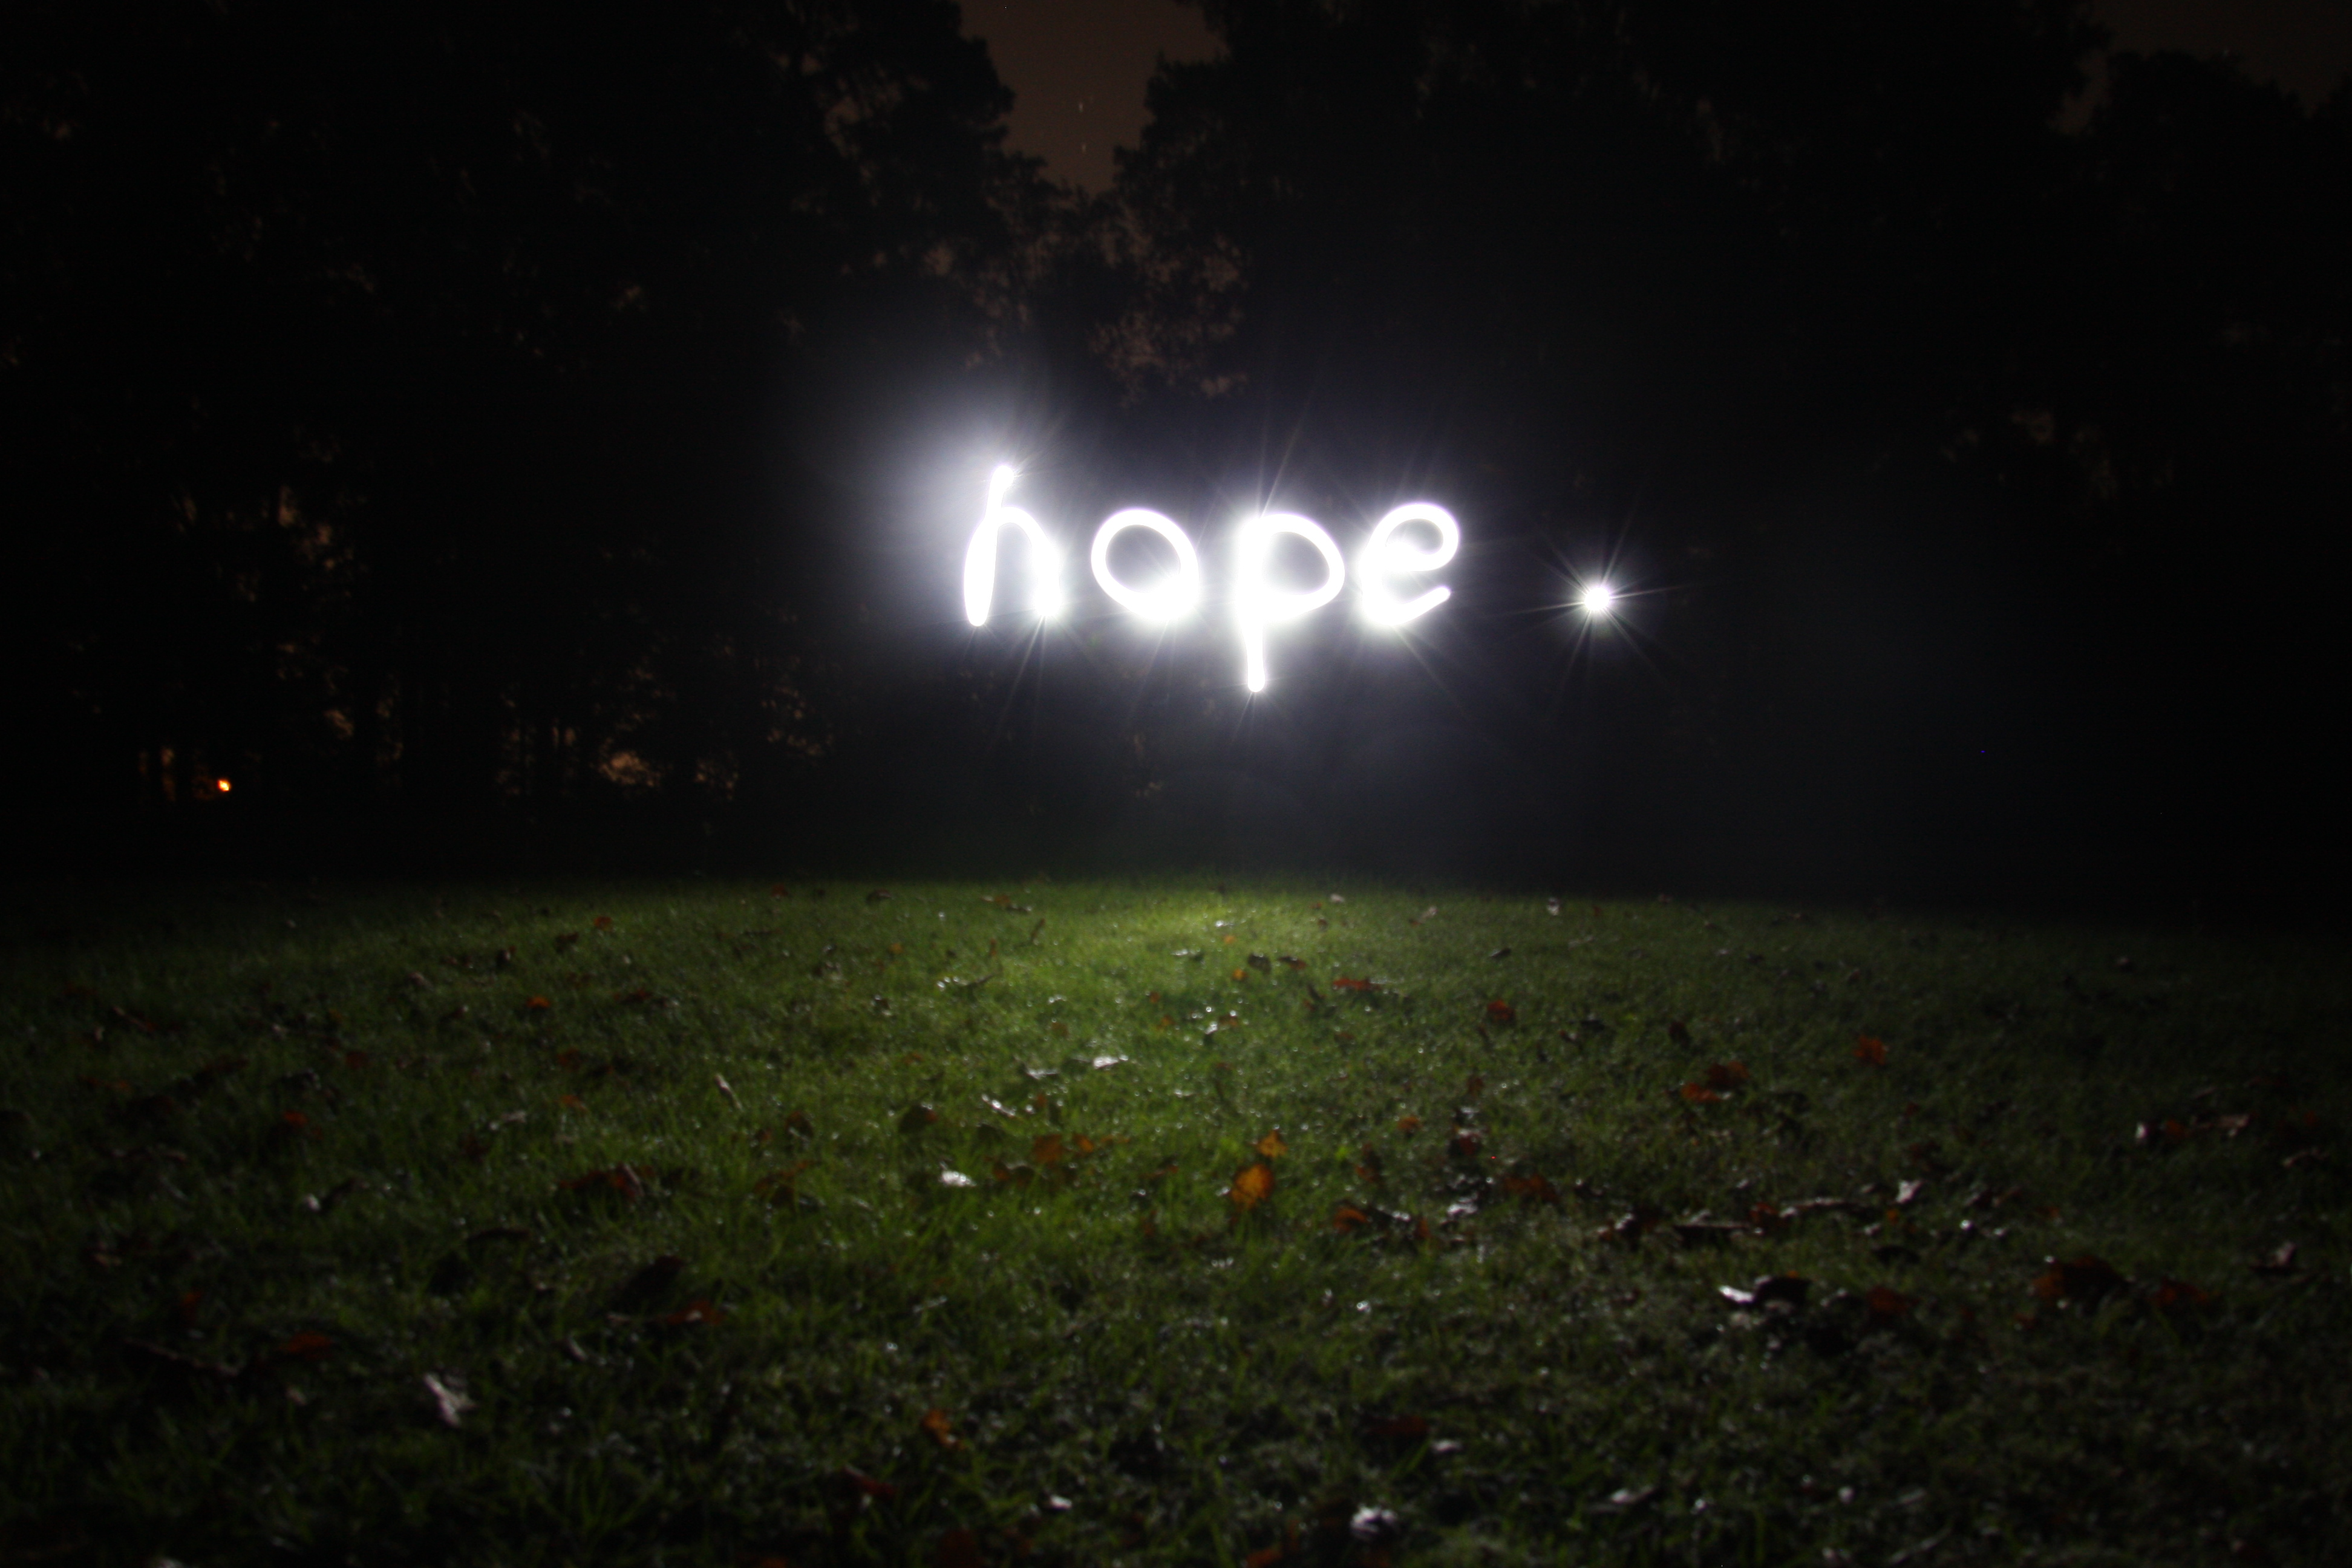 Hope 171 Simply Danlrene S Opinion